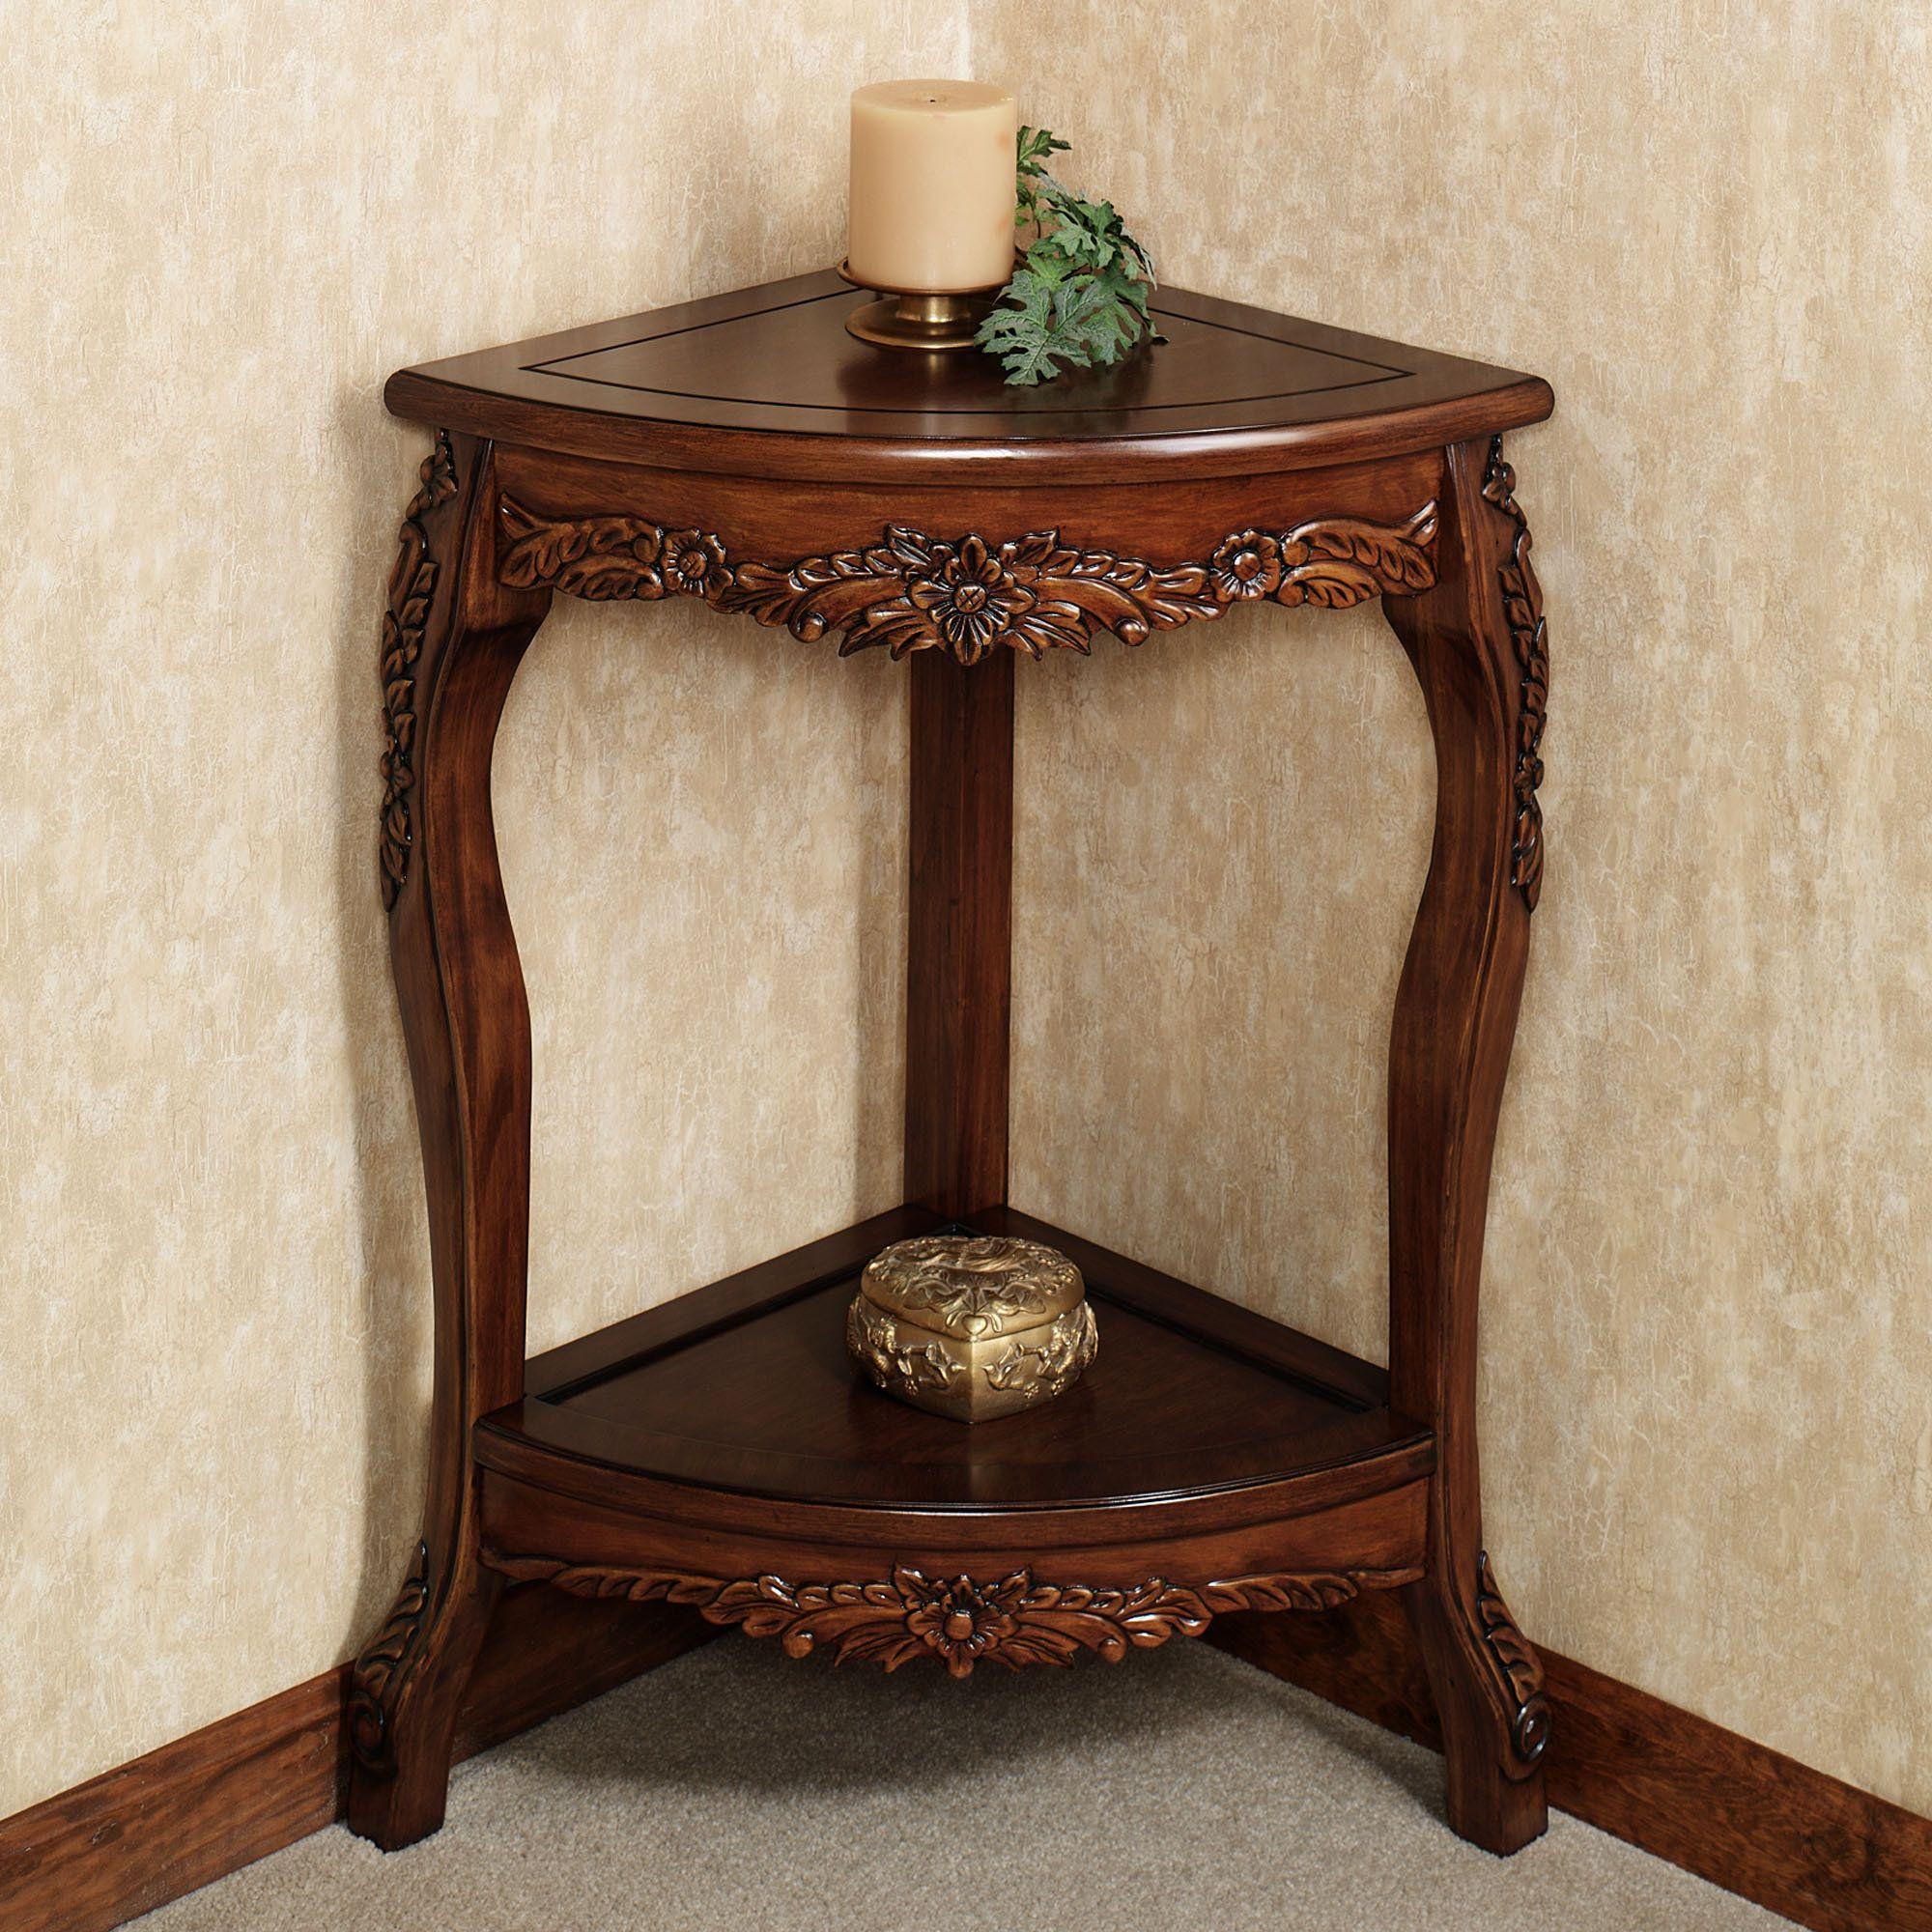 Victoriana Corner Pedestal Tablenatural Cherry Corner Table Designs Corner Accent Table Accent Table Decor